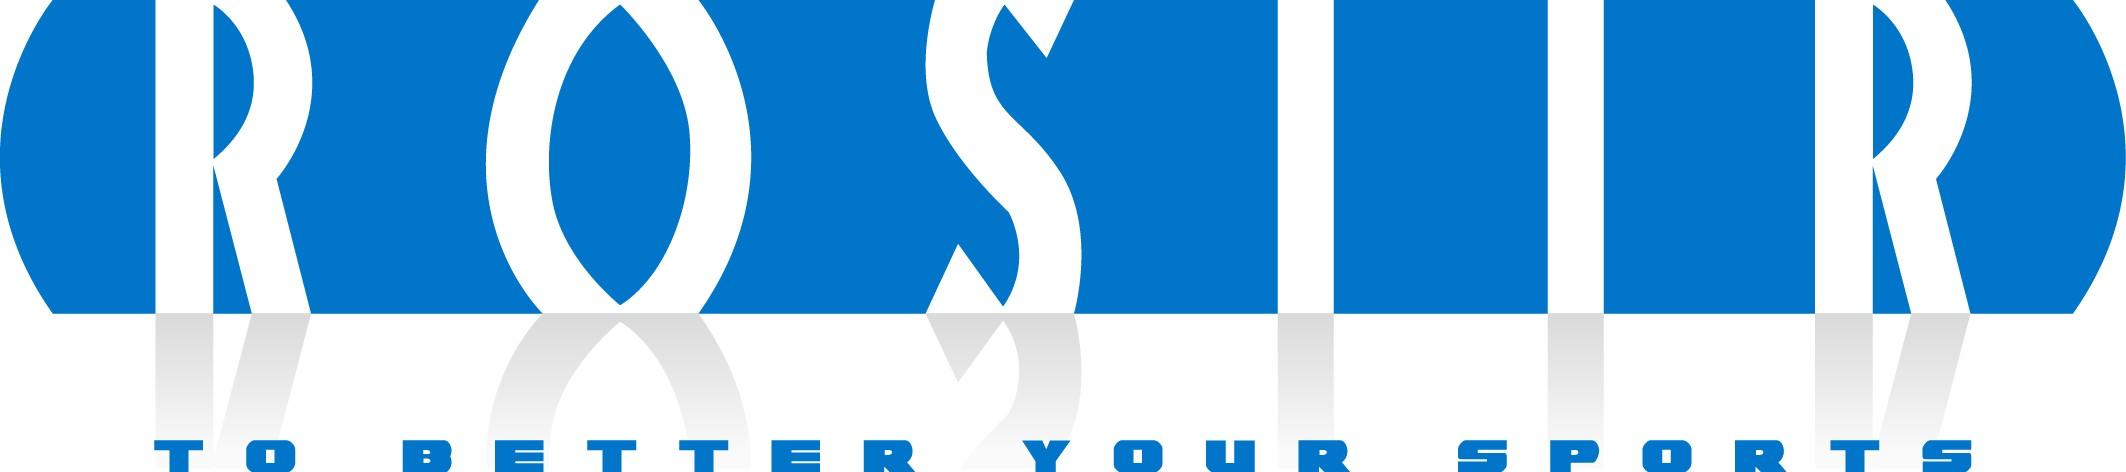 my-store-logo-1479819531jpg